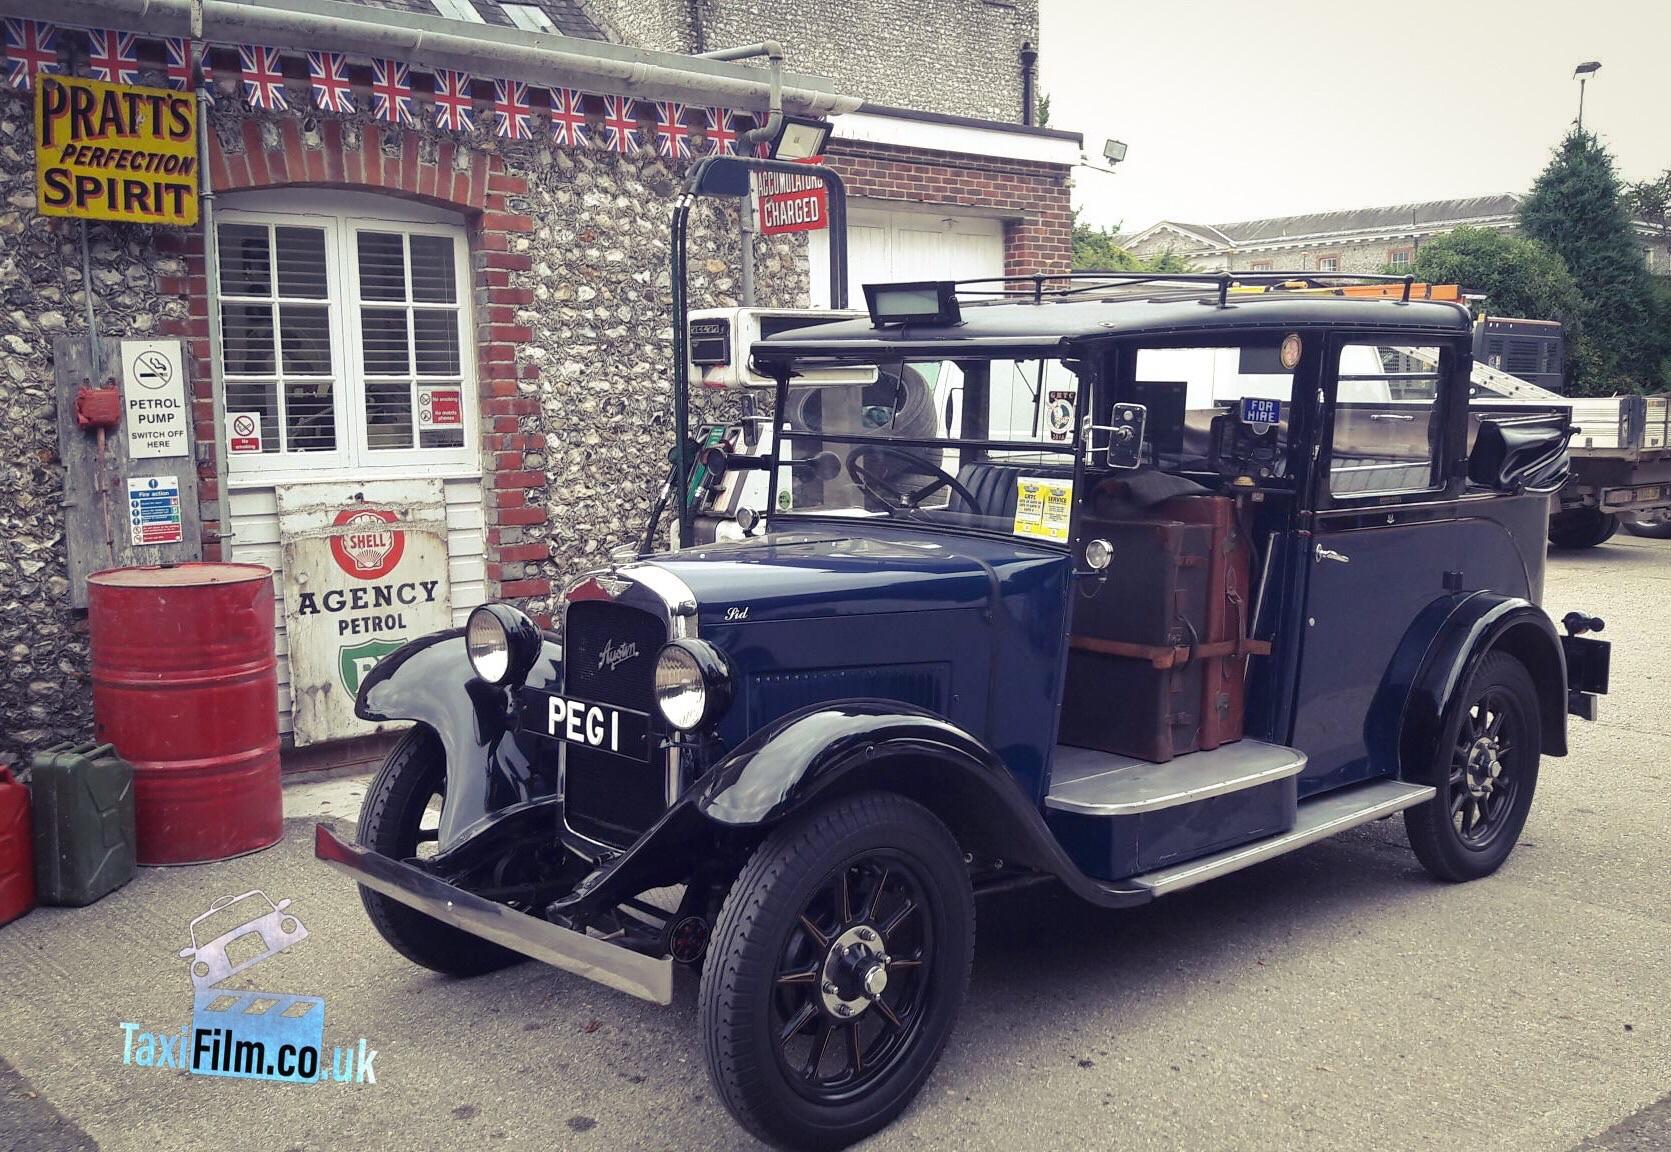 Blue / Black Austin London Taxi 1937, Low Loader, Dunstable ref B0303